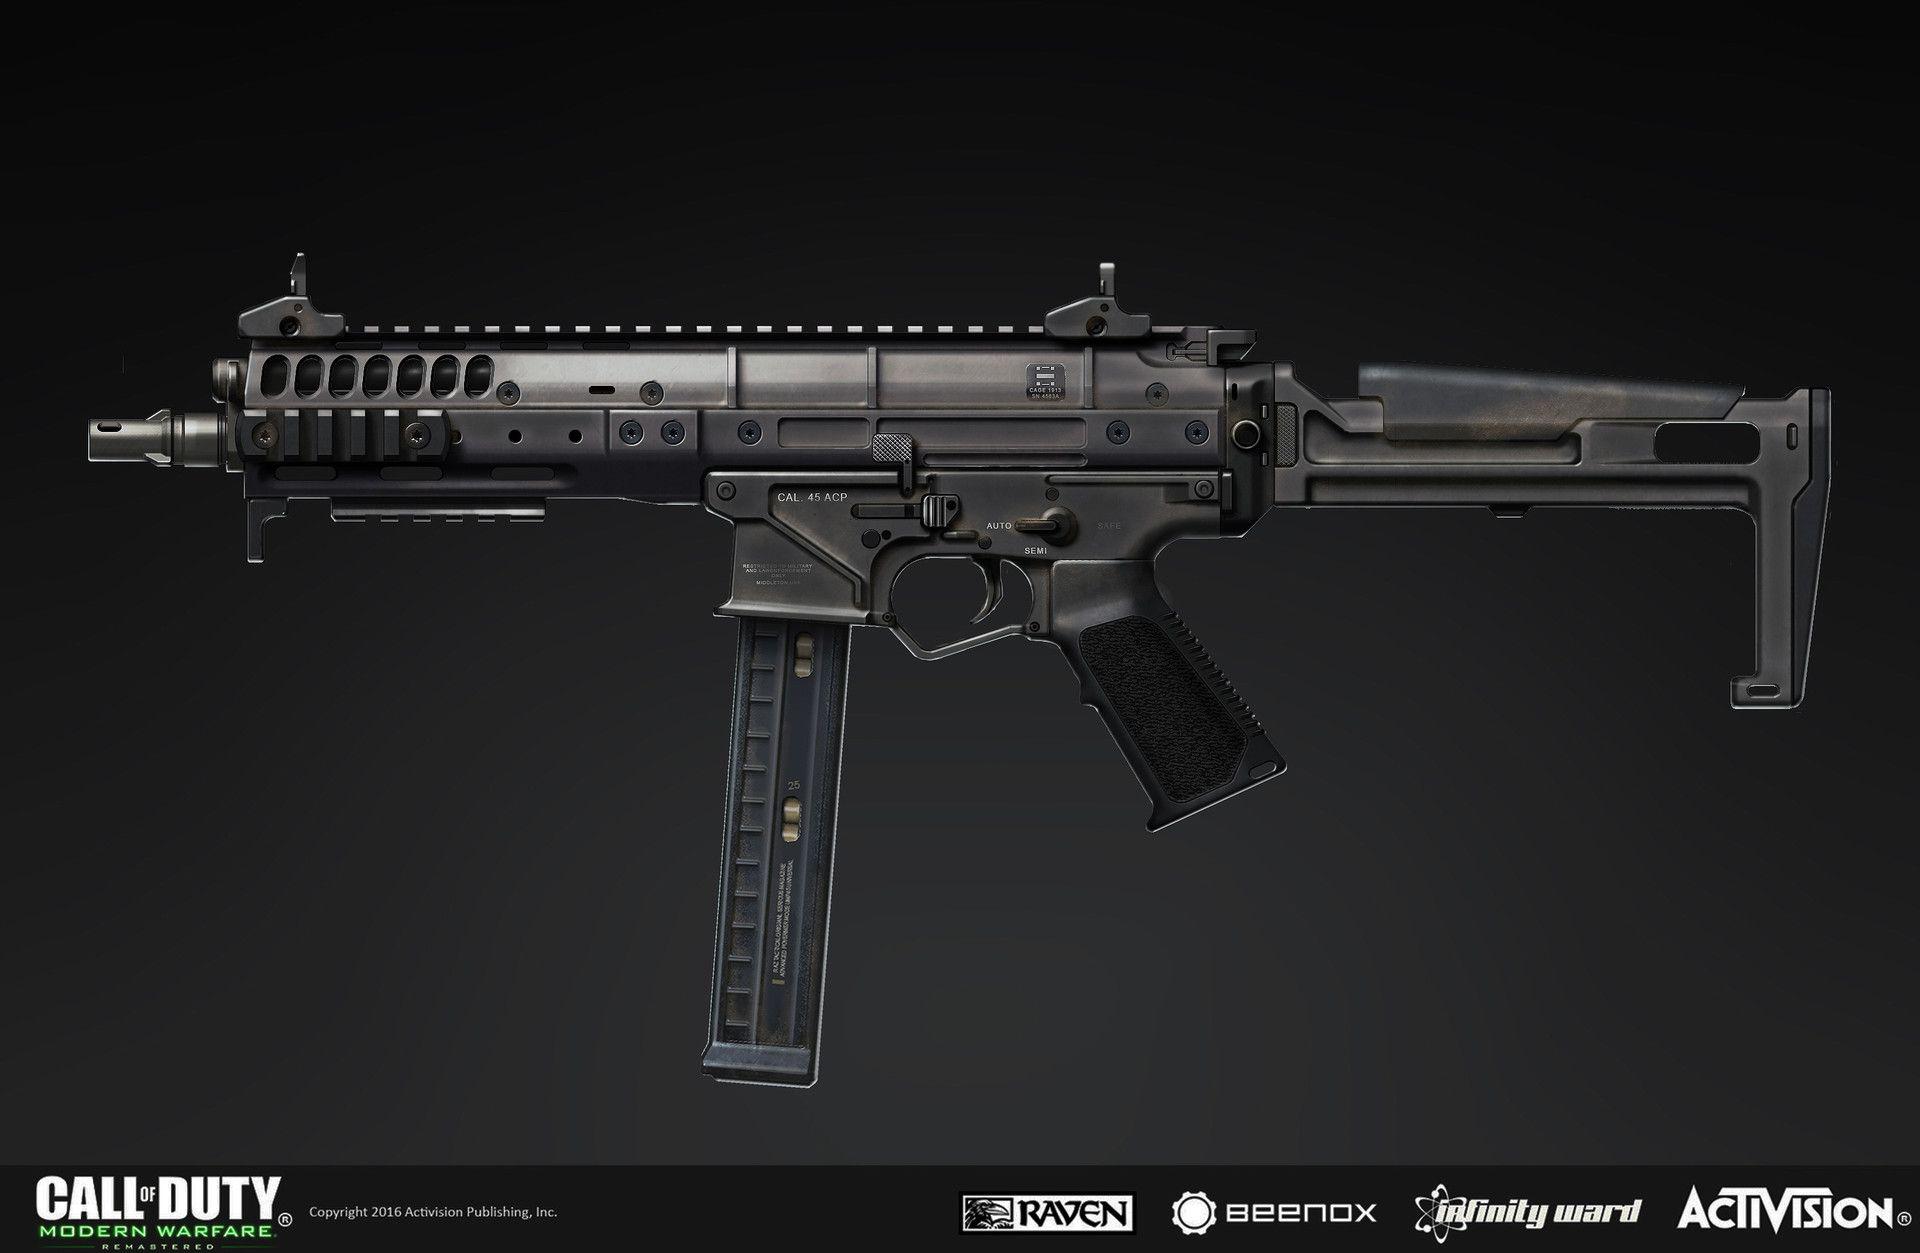 Pin On Weapons 3d Backyard bbq modern warfare